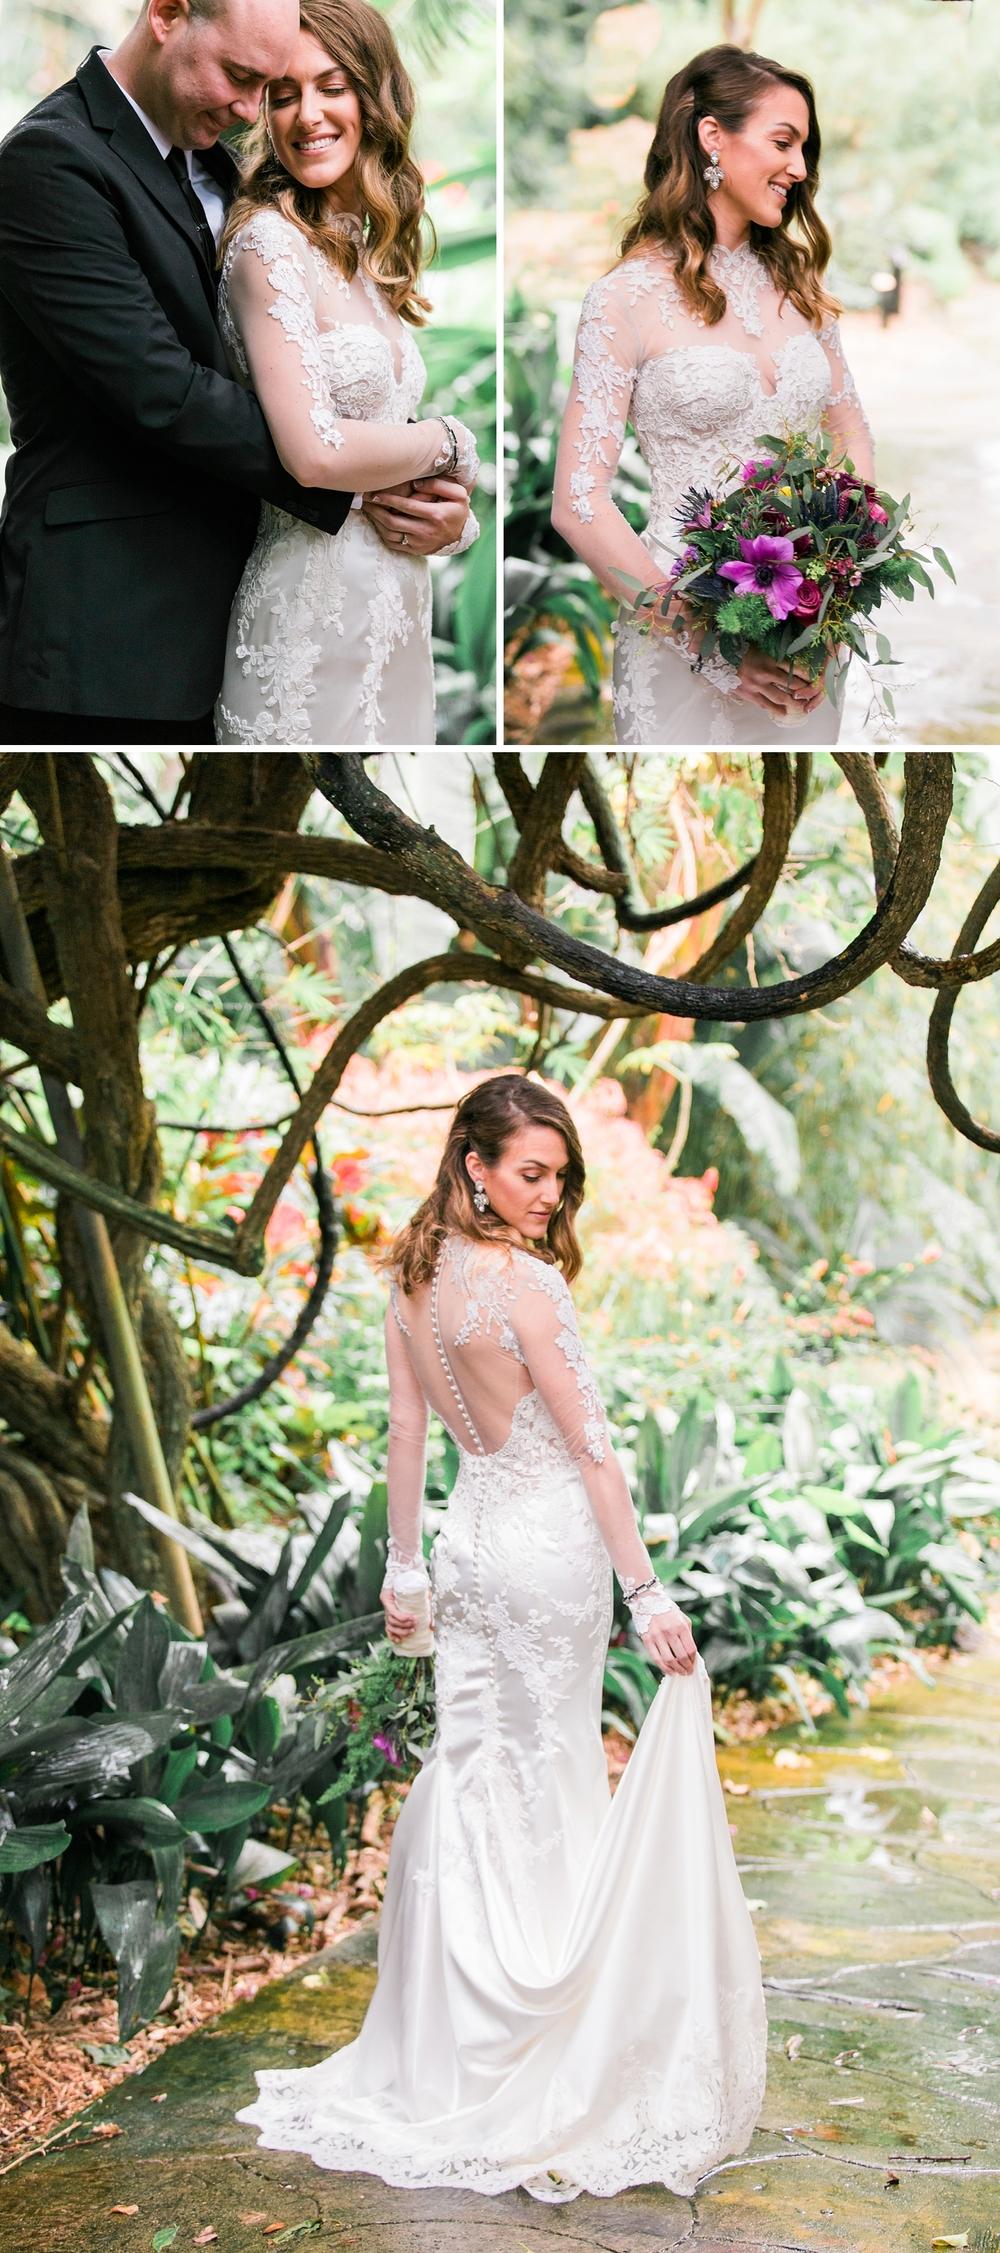 orlando-wedding-photography-justin-gilbert-tampa-sunken-gardens_0009.jpg